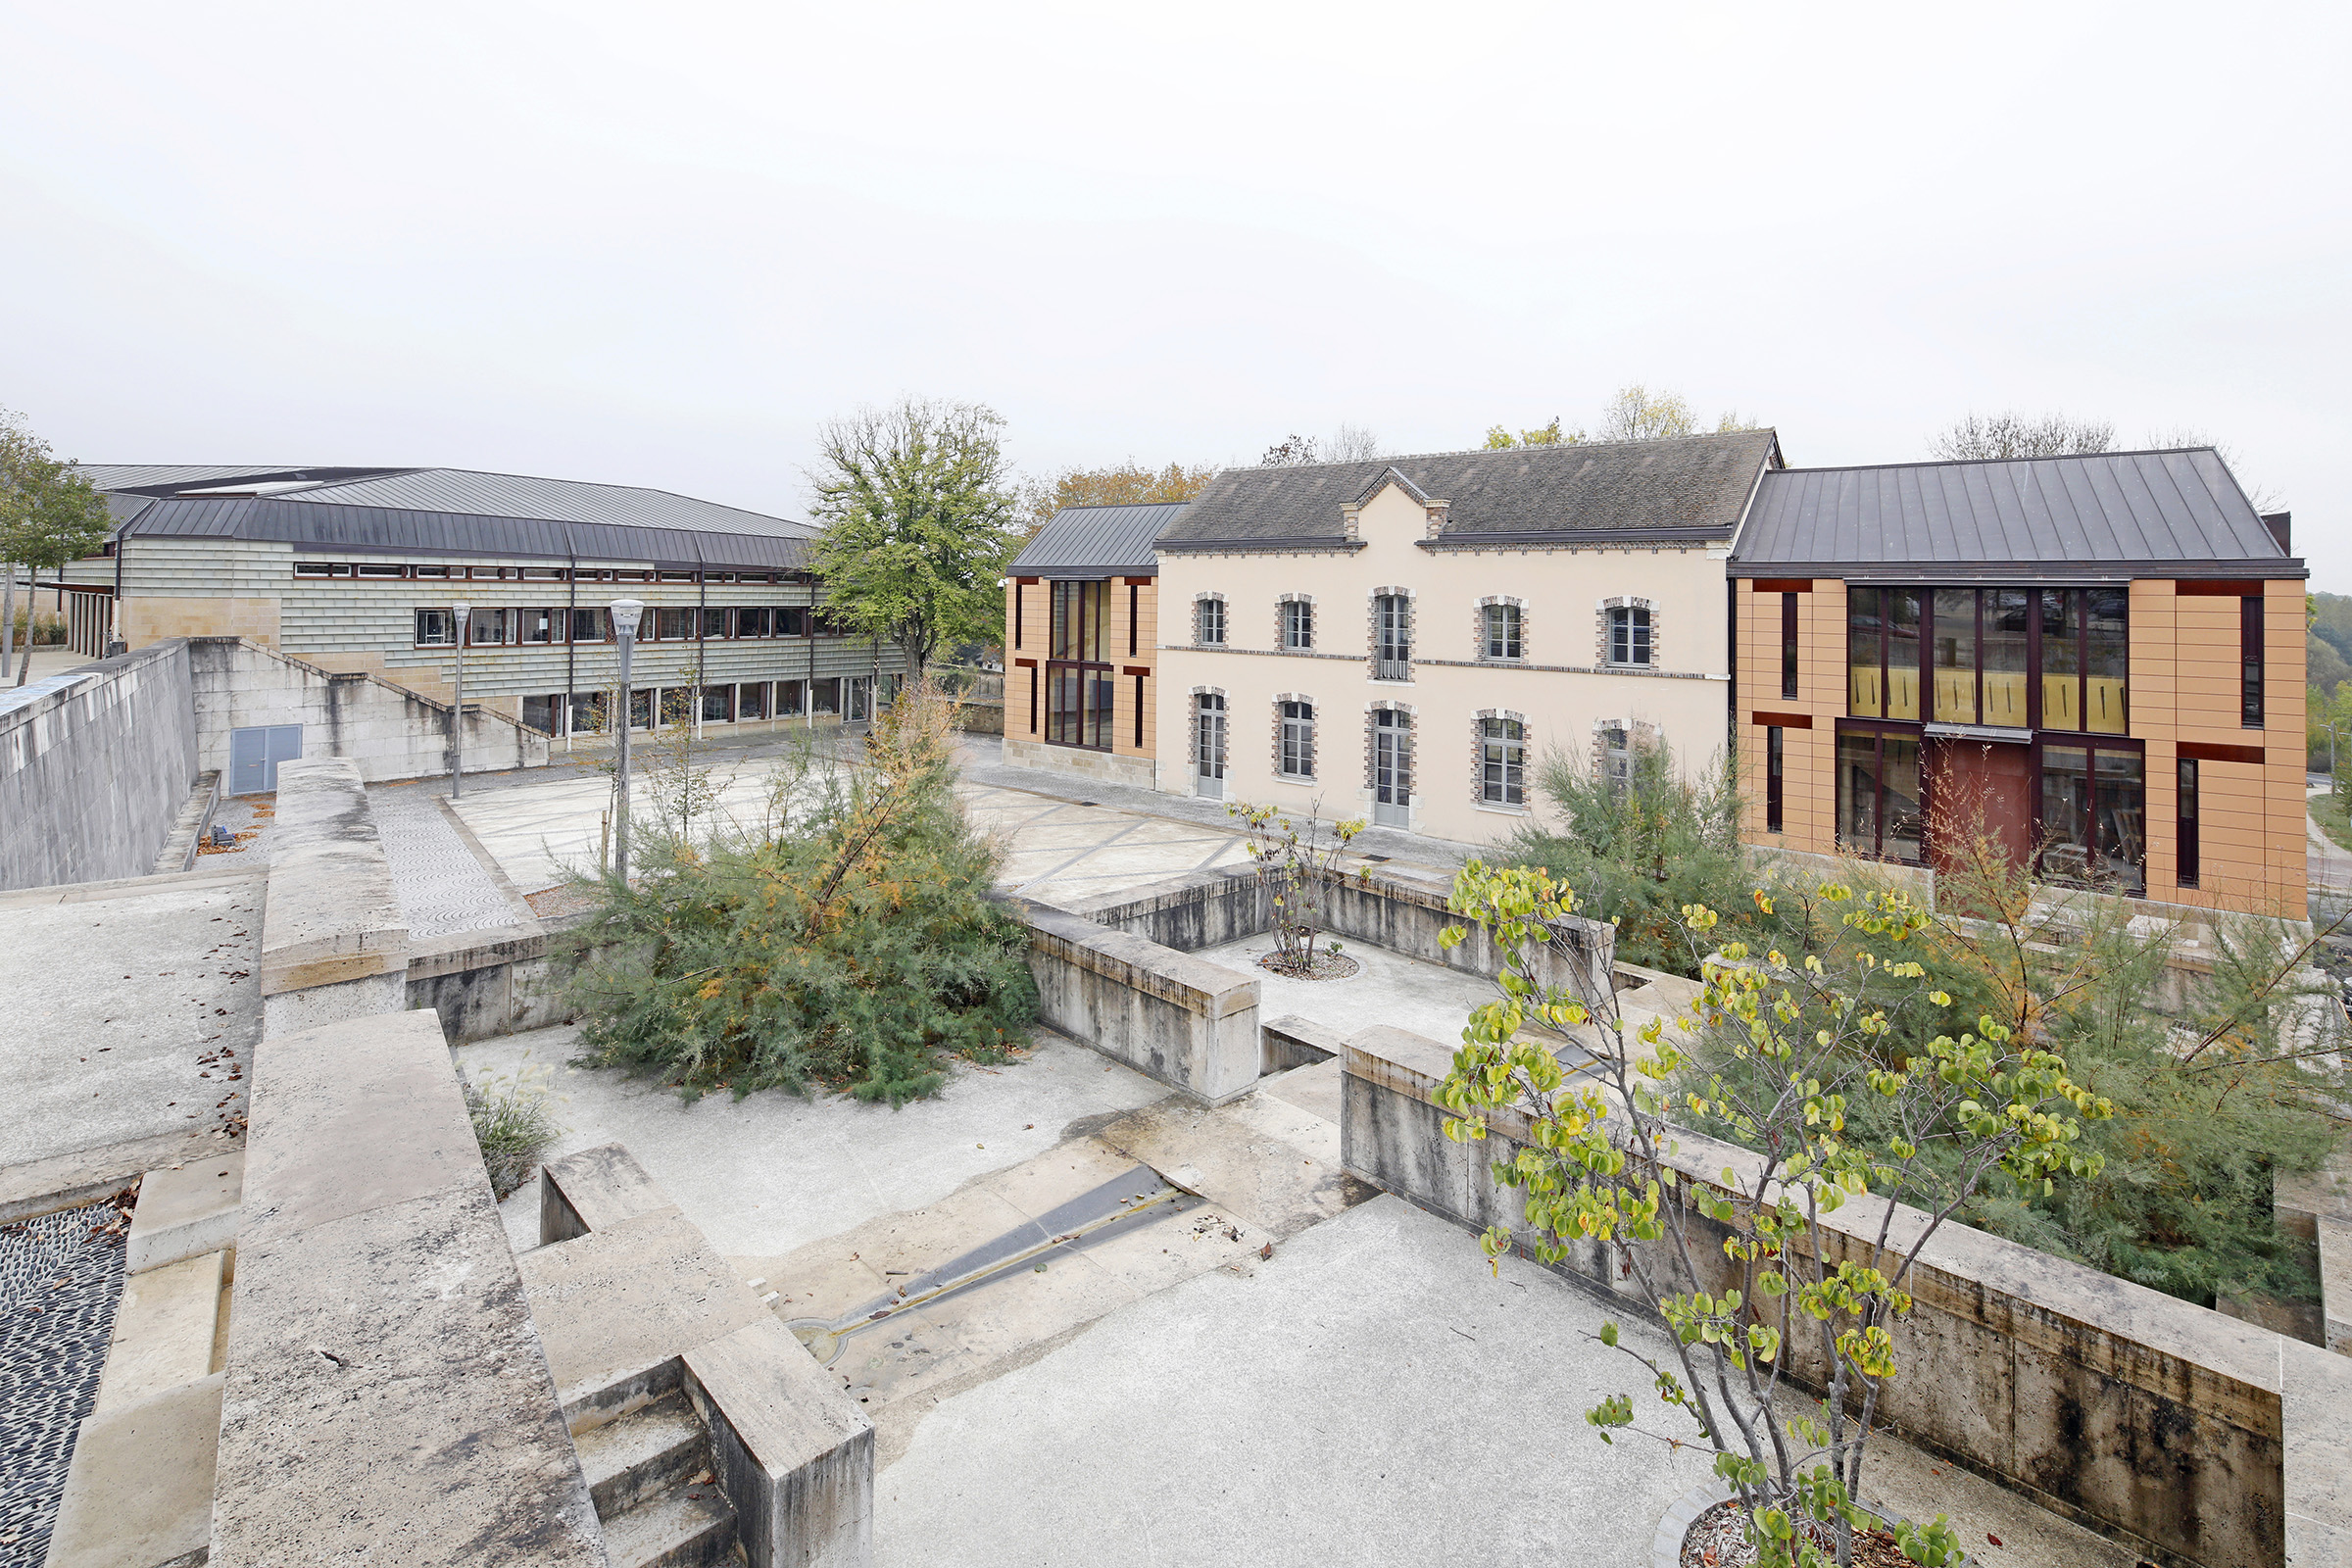 Amilly - La Maison Saint Loup - Sylvain Dubuisson 007.jpg